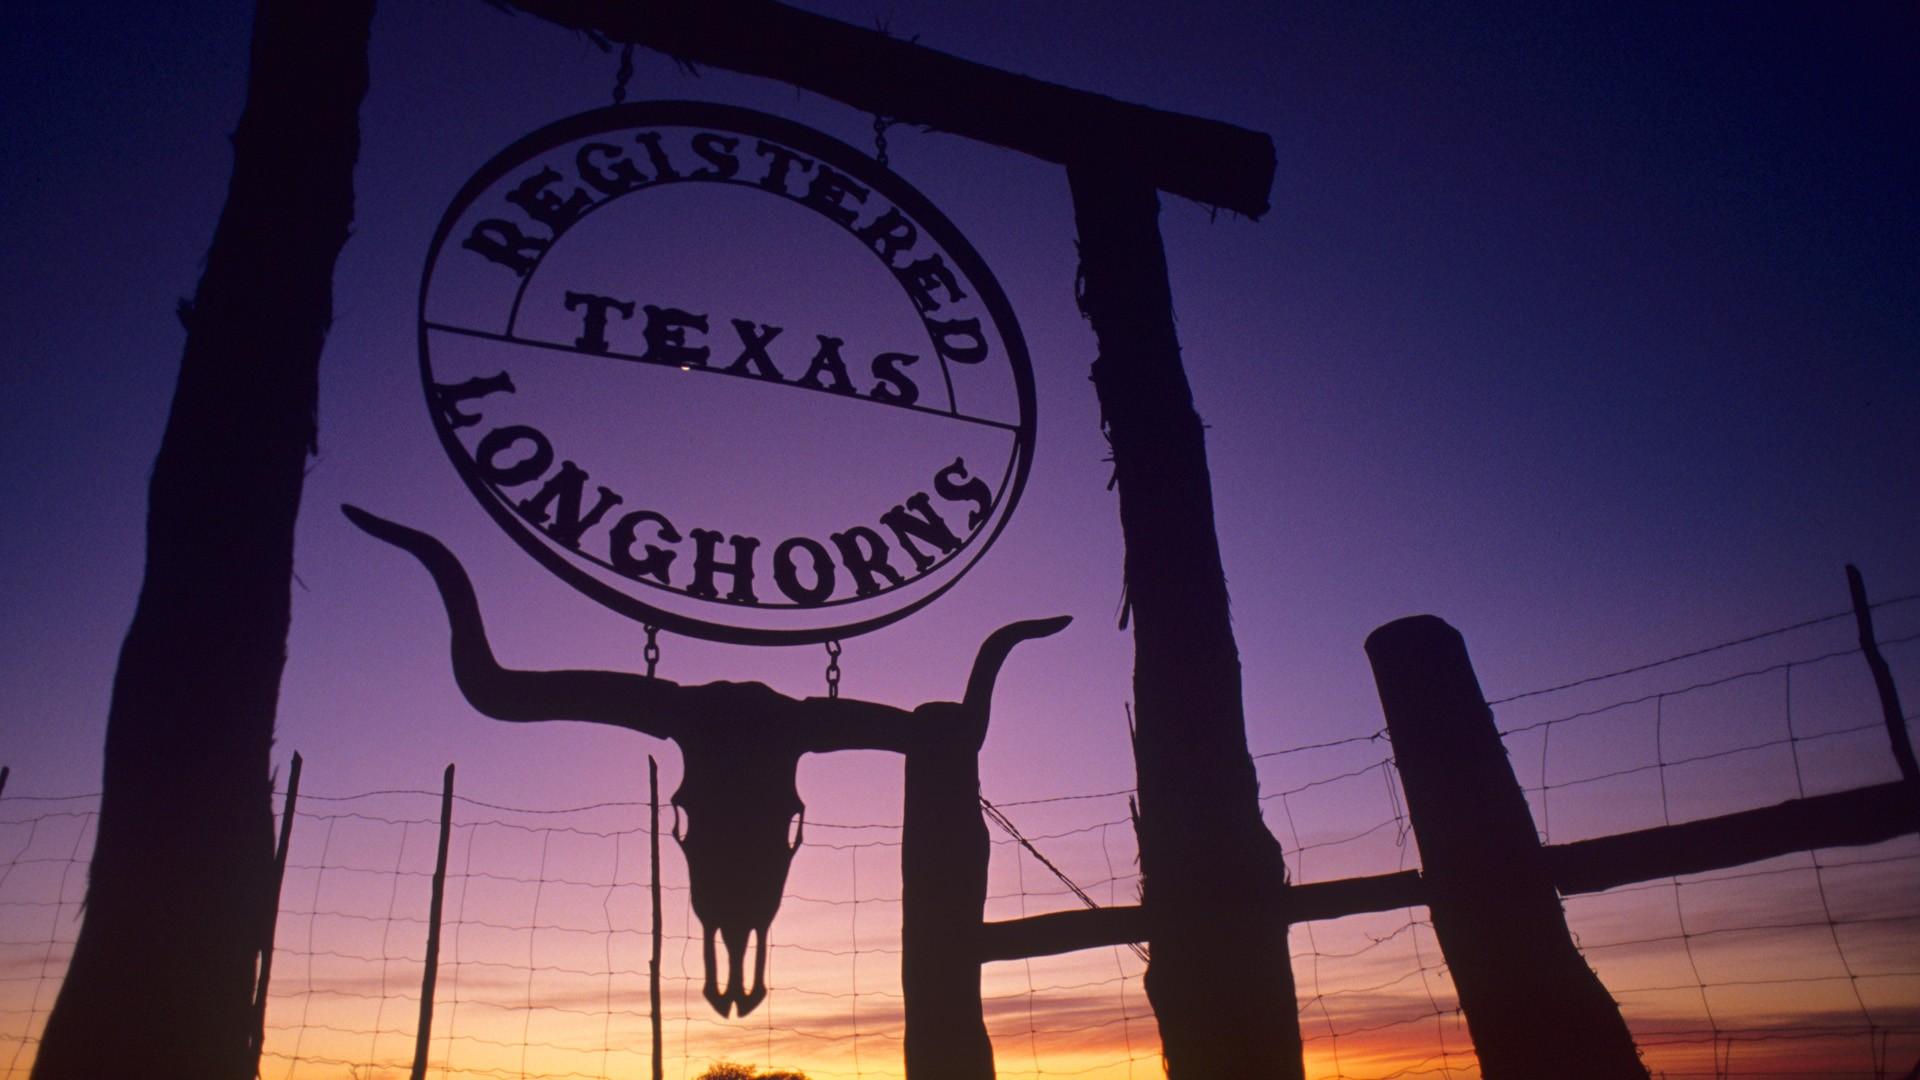 Texas Backgrounds 1920x1080